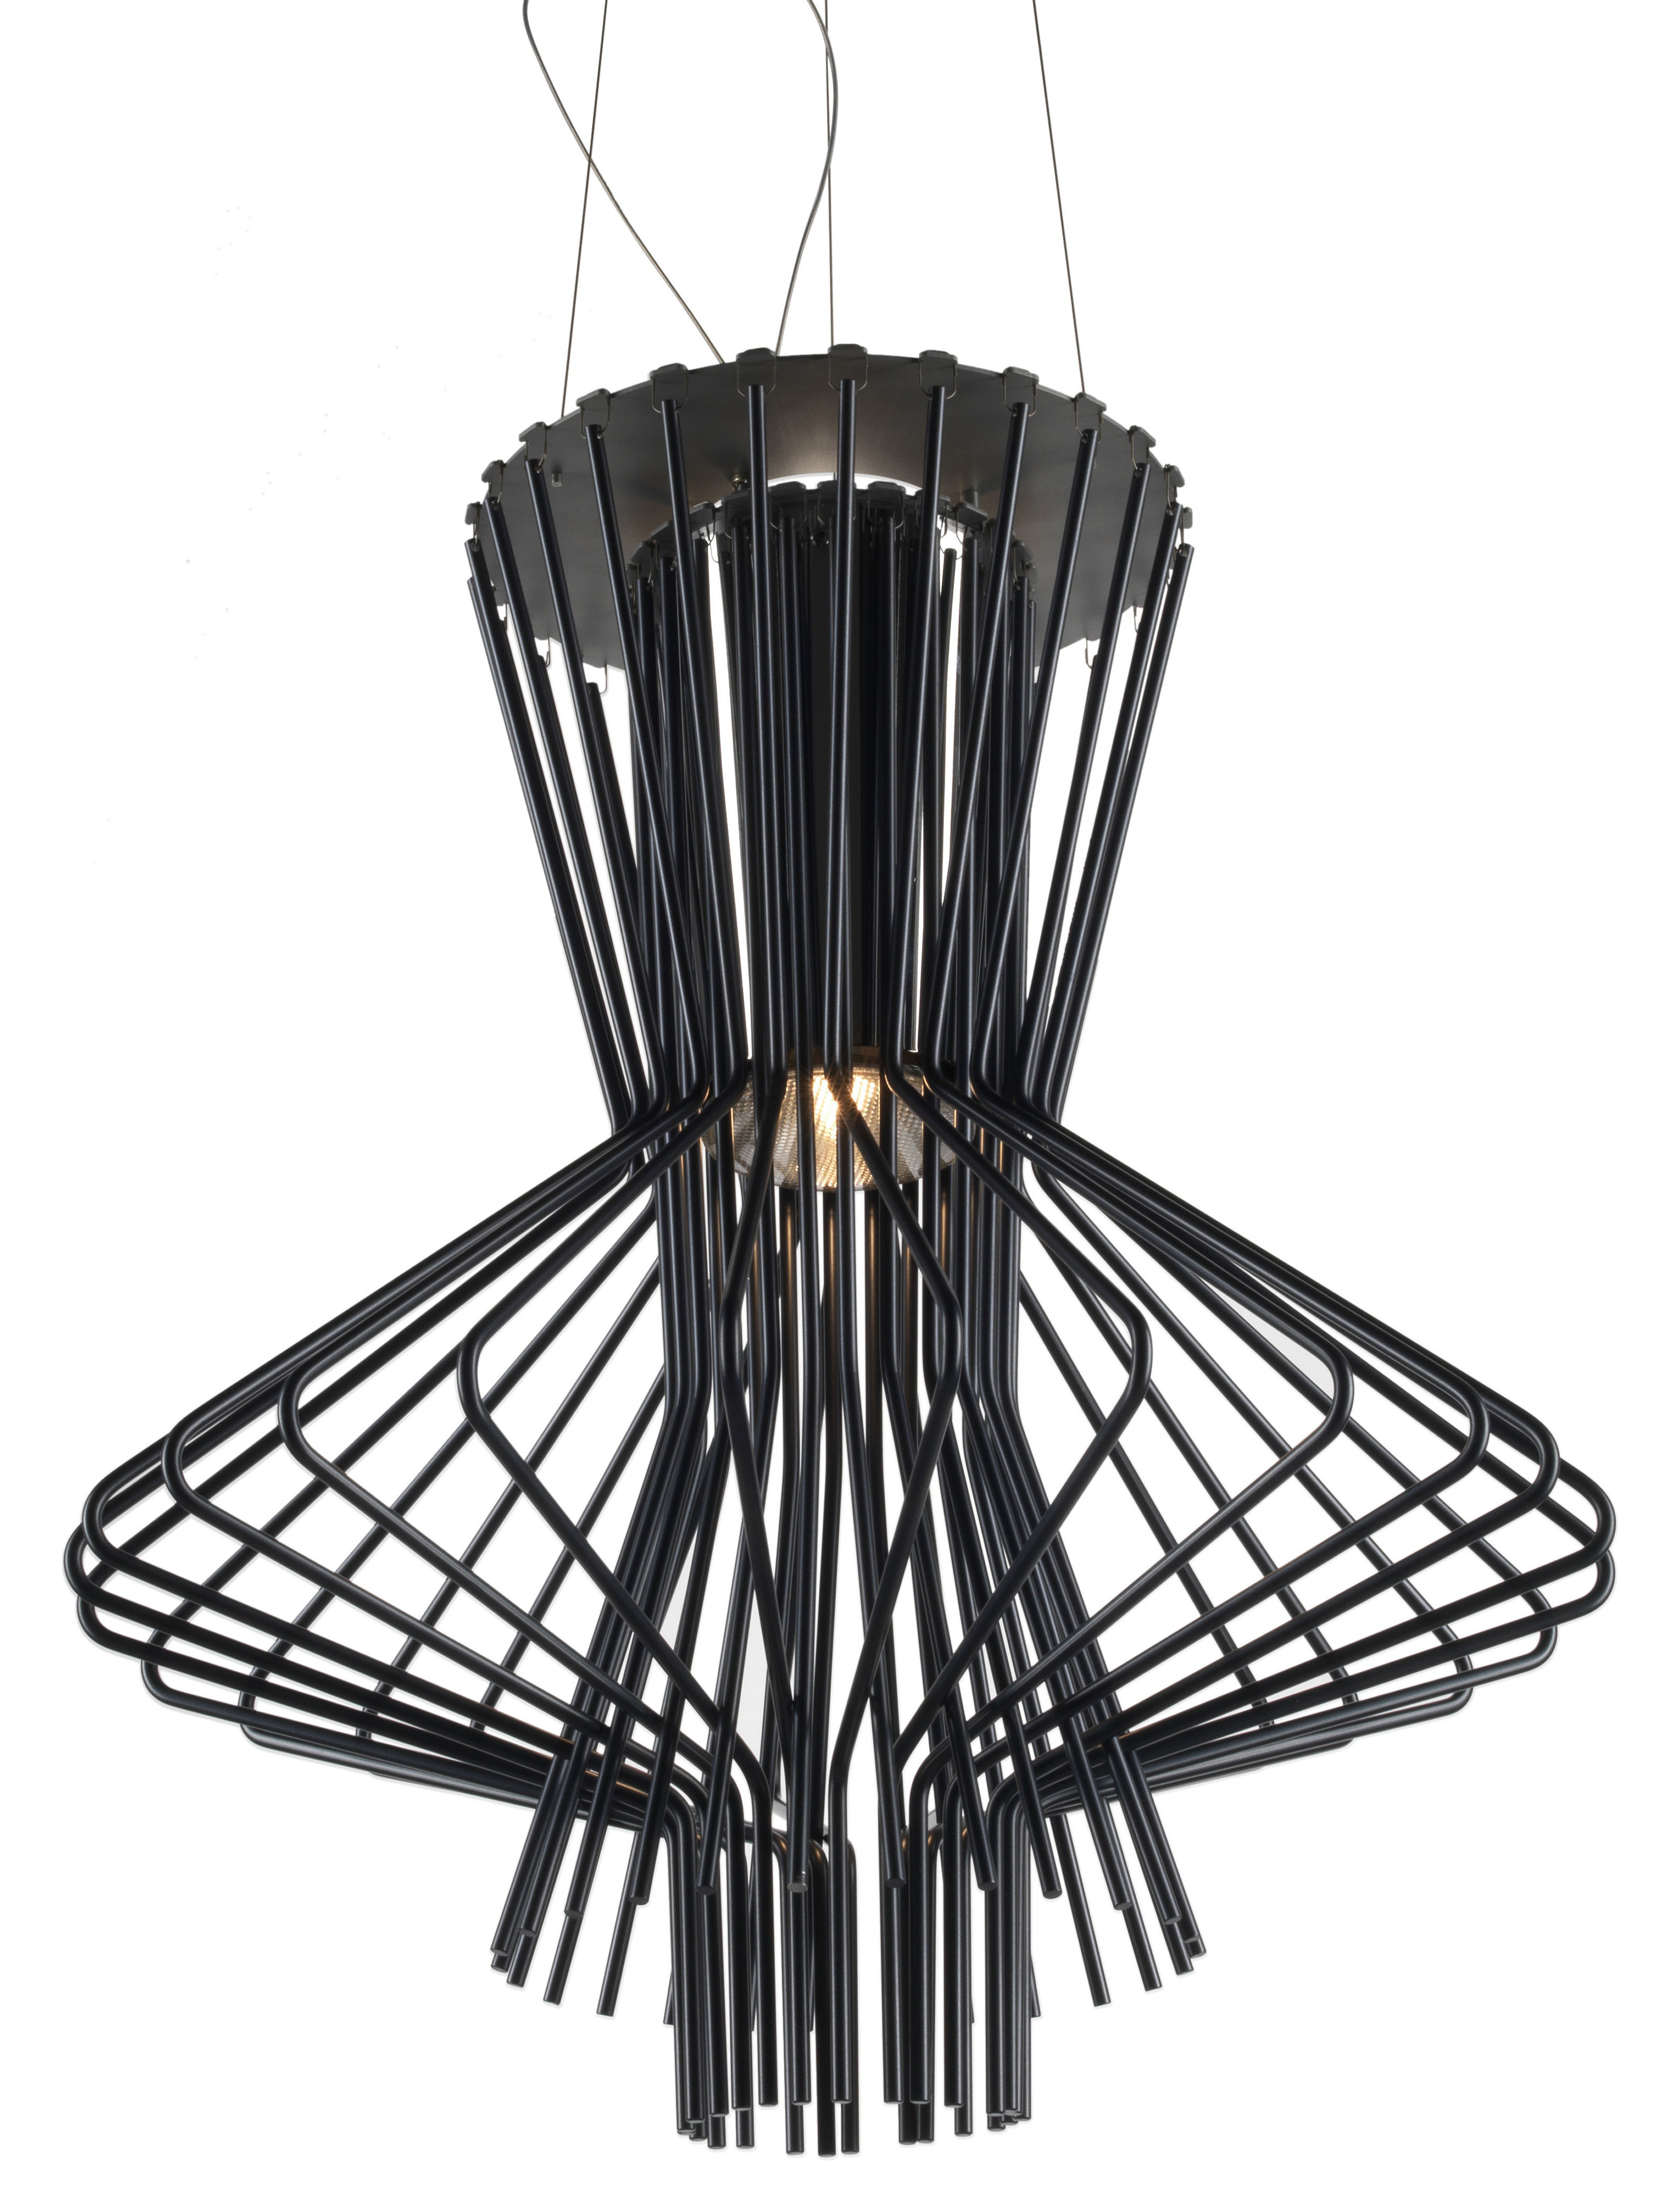 Lighting - Pendant Lighting - Allegro Ritmico Pendant by Foscarini - Black - Aluminium